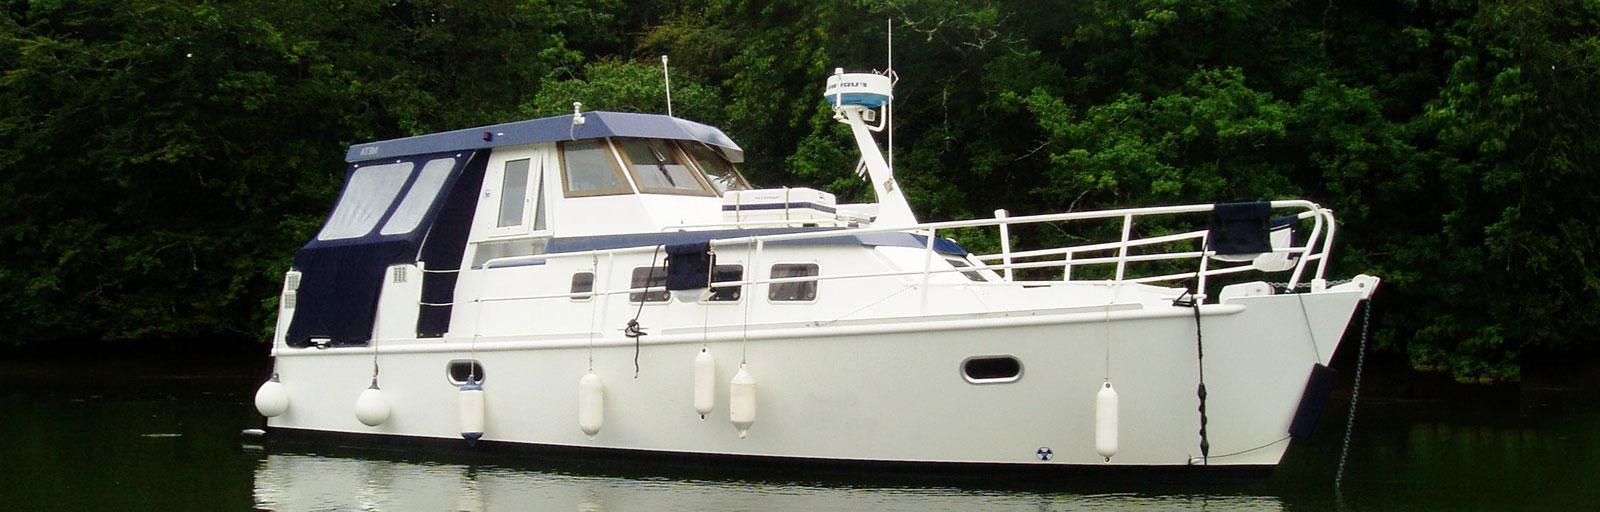 AYC Yachtbroker - Meta Trawler 33